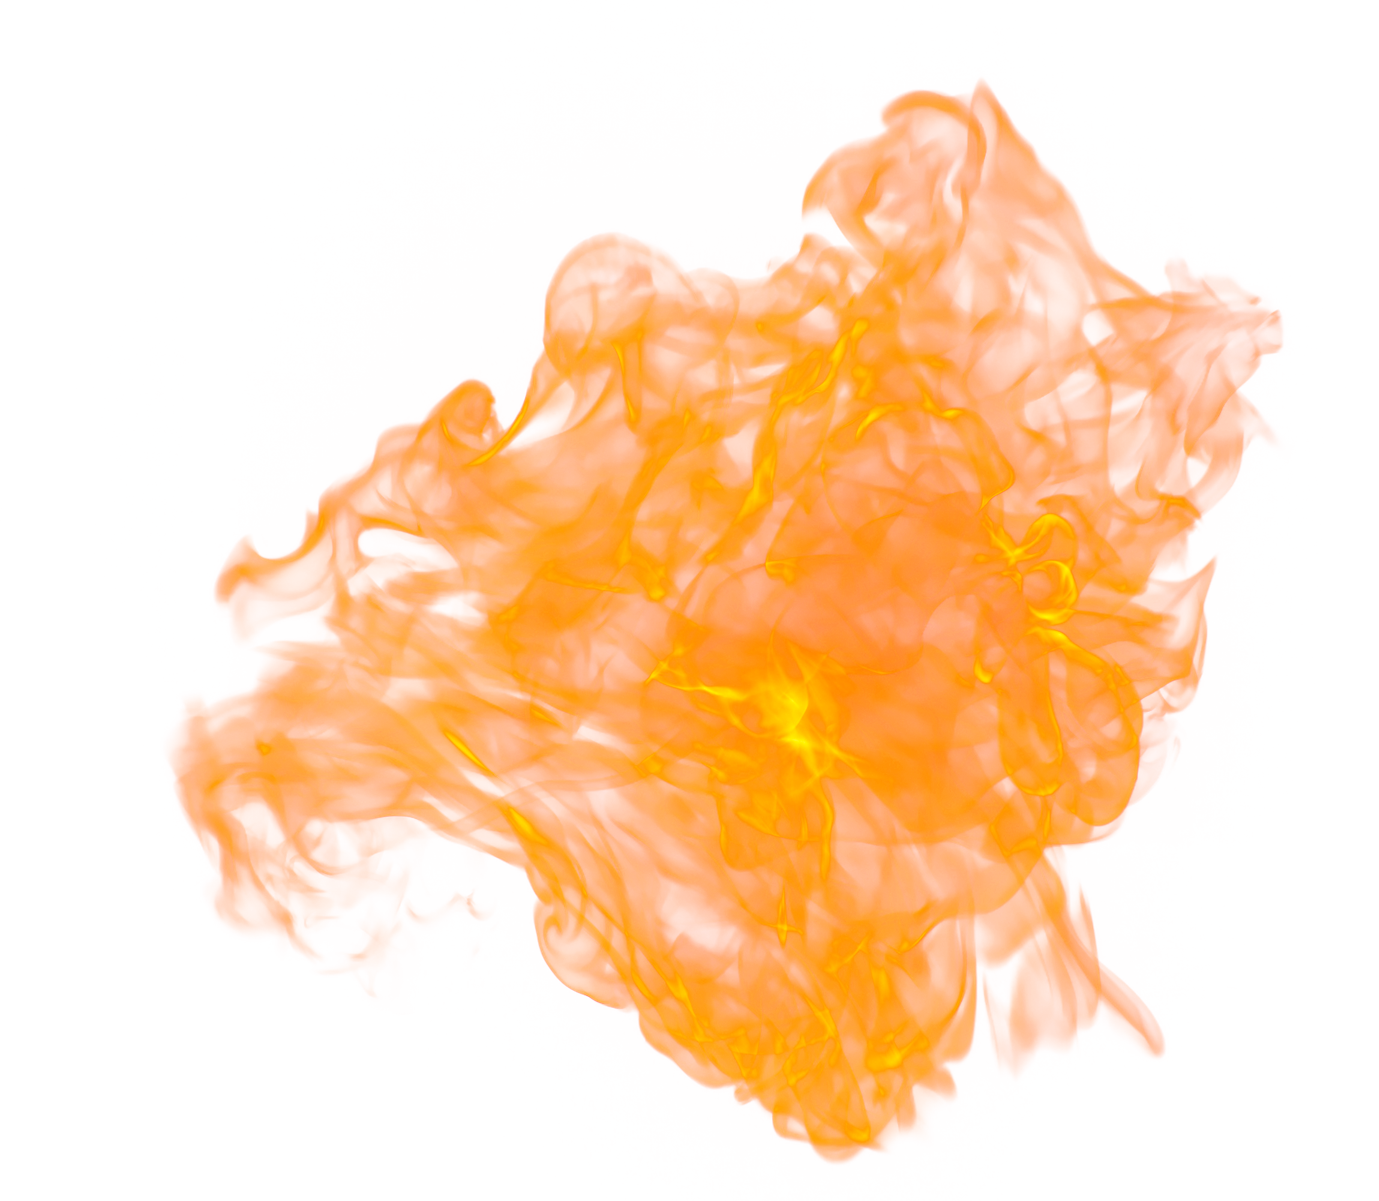 Fire Flaming Hot PNG Image - PurePNG | Free transparent ...